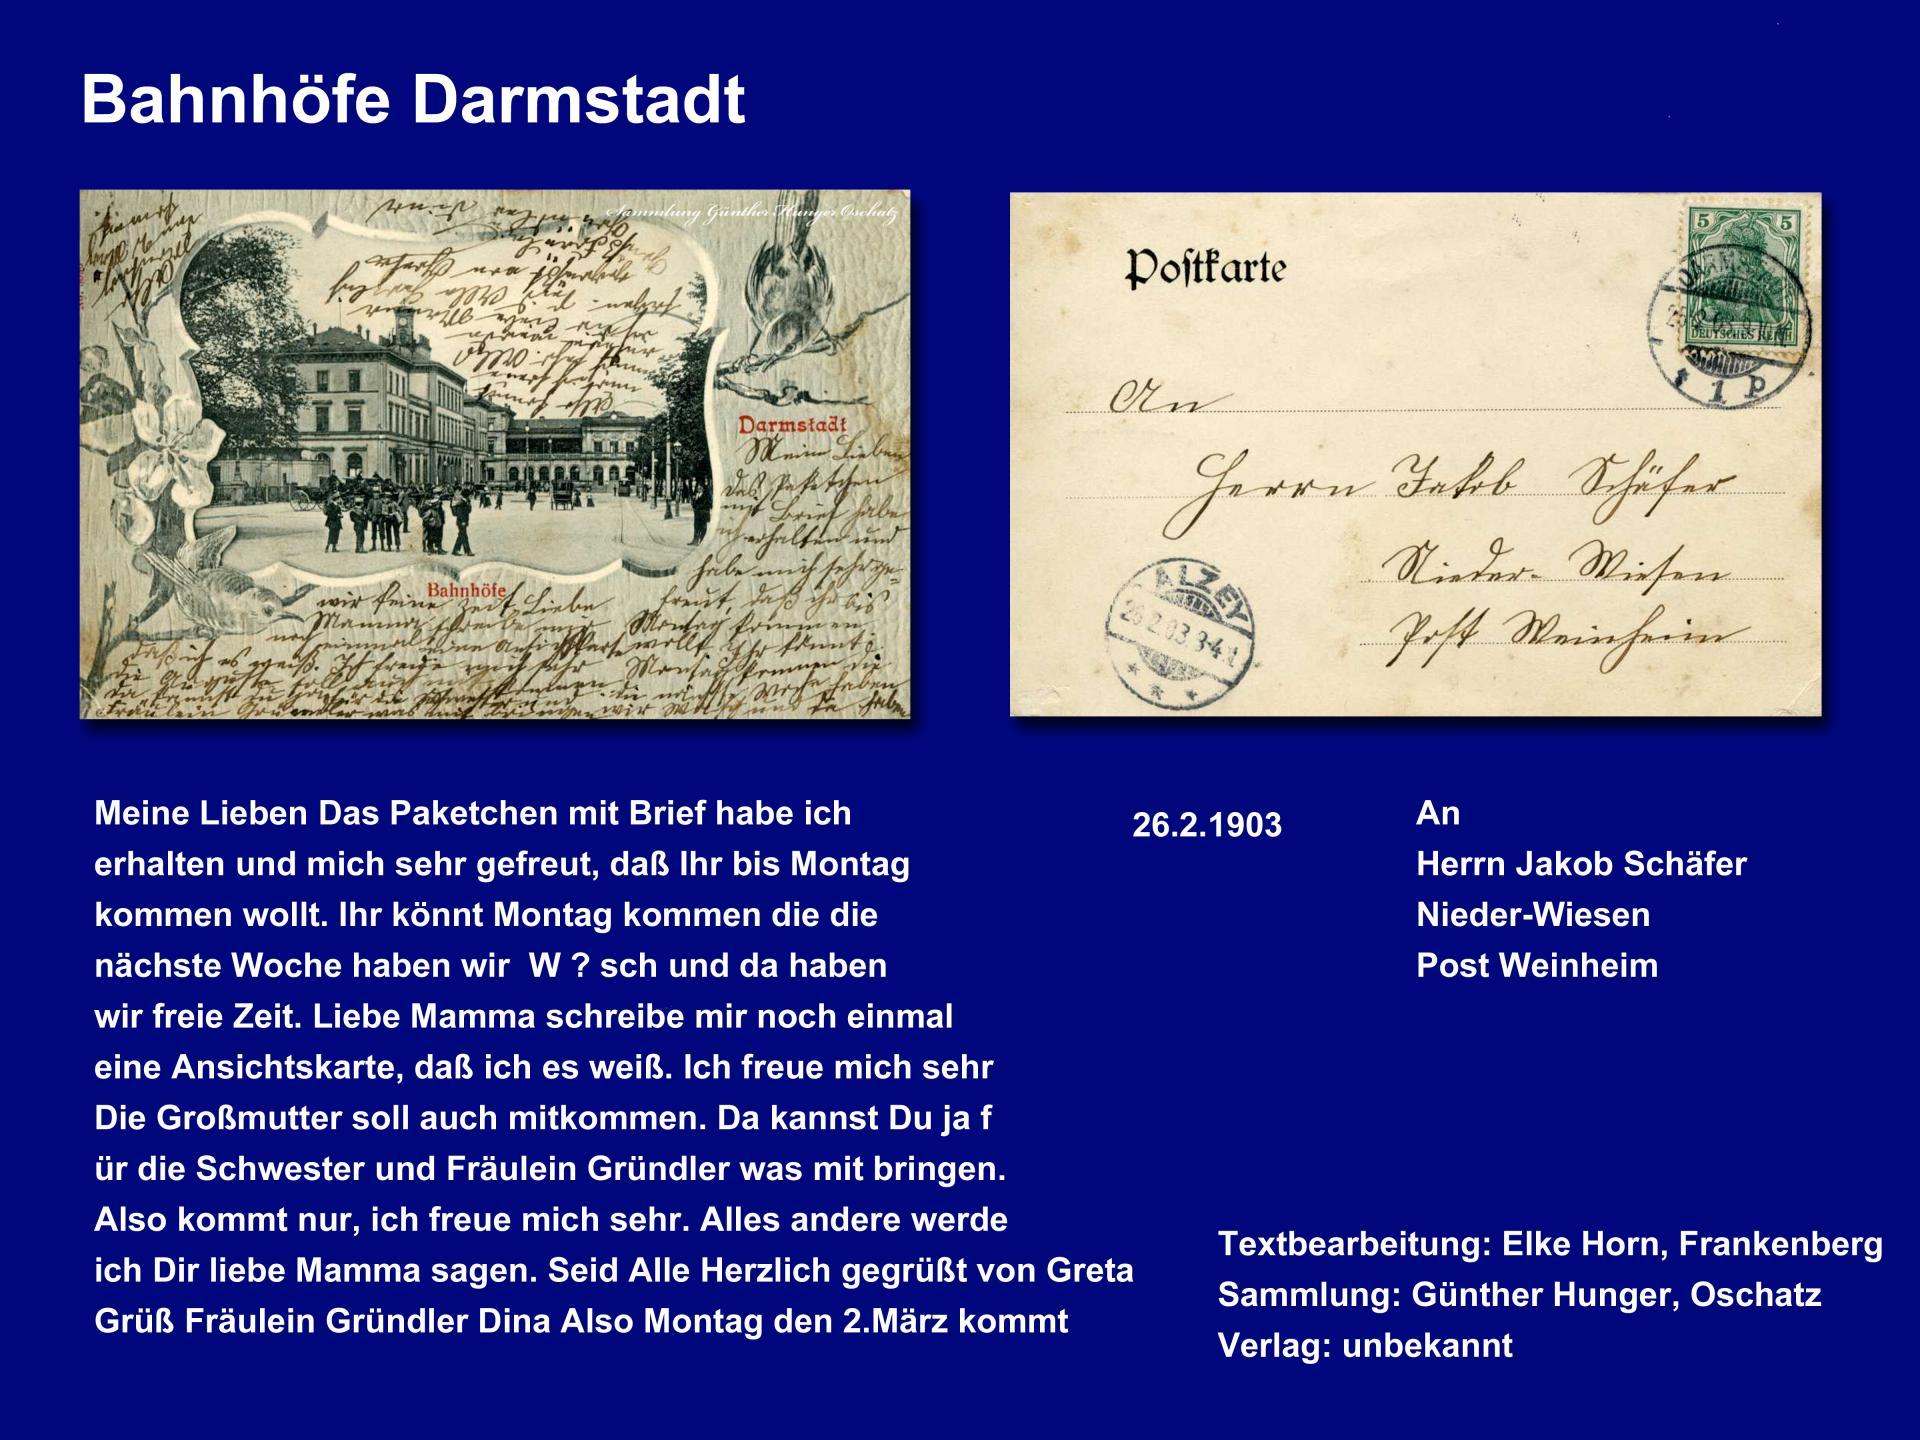 Bahnhof Darmstadt